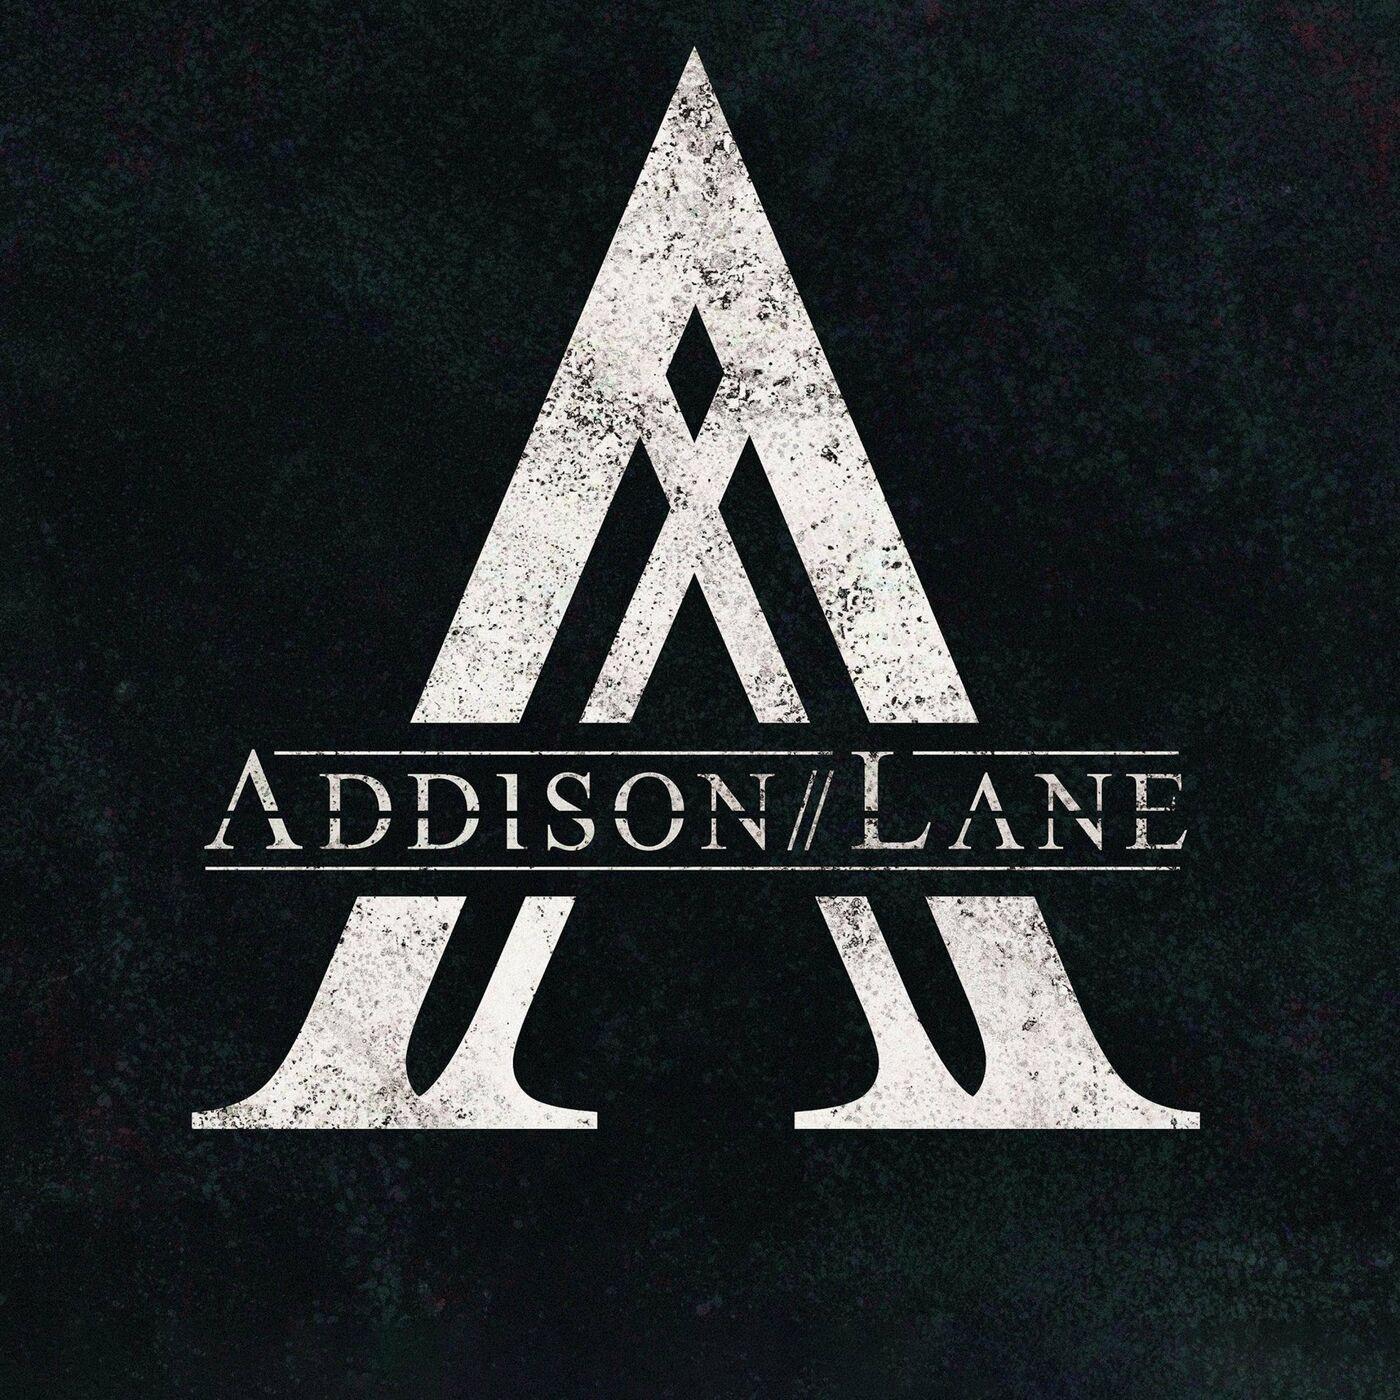 Addison//lane - The Nation's End [single] (2020)